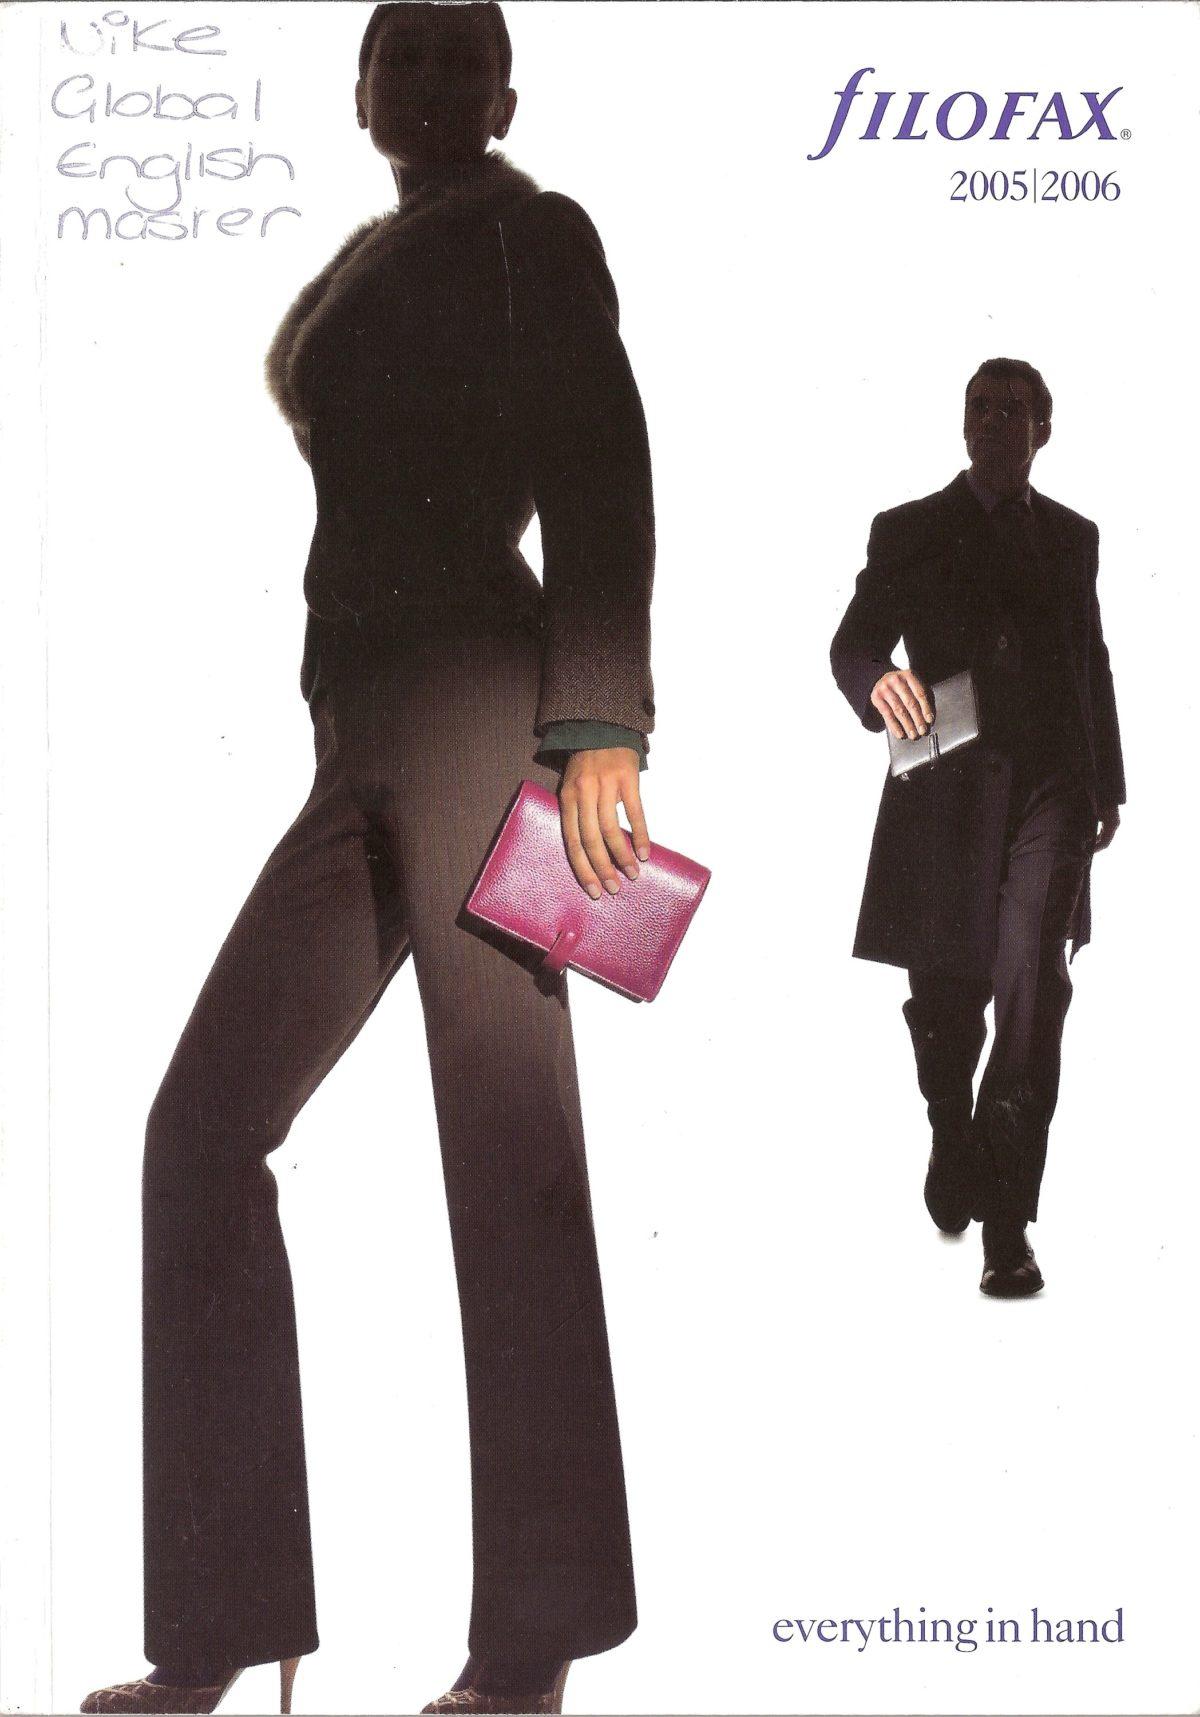 Global English full catalogue 2005/6